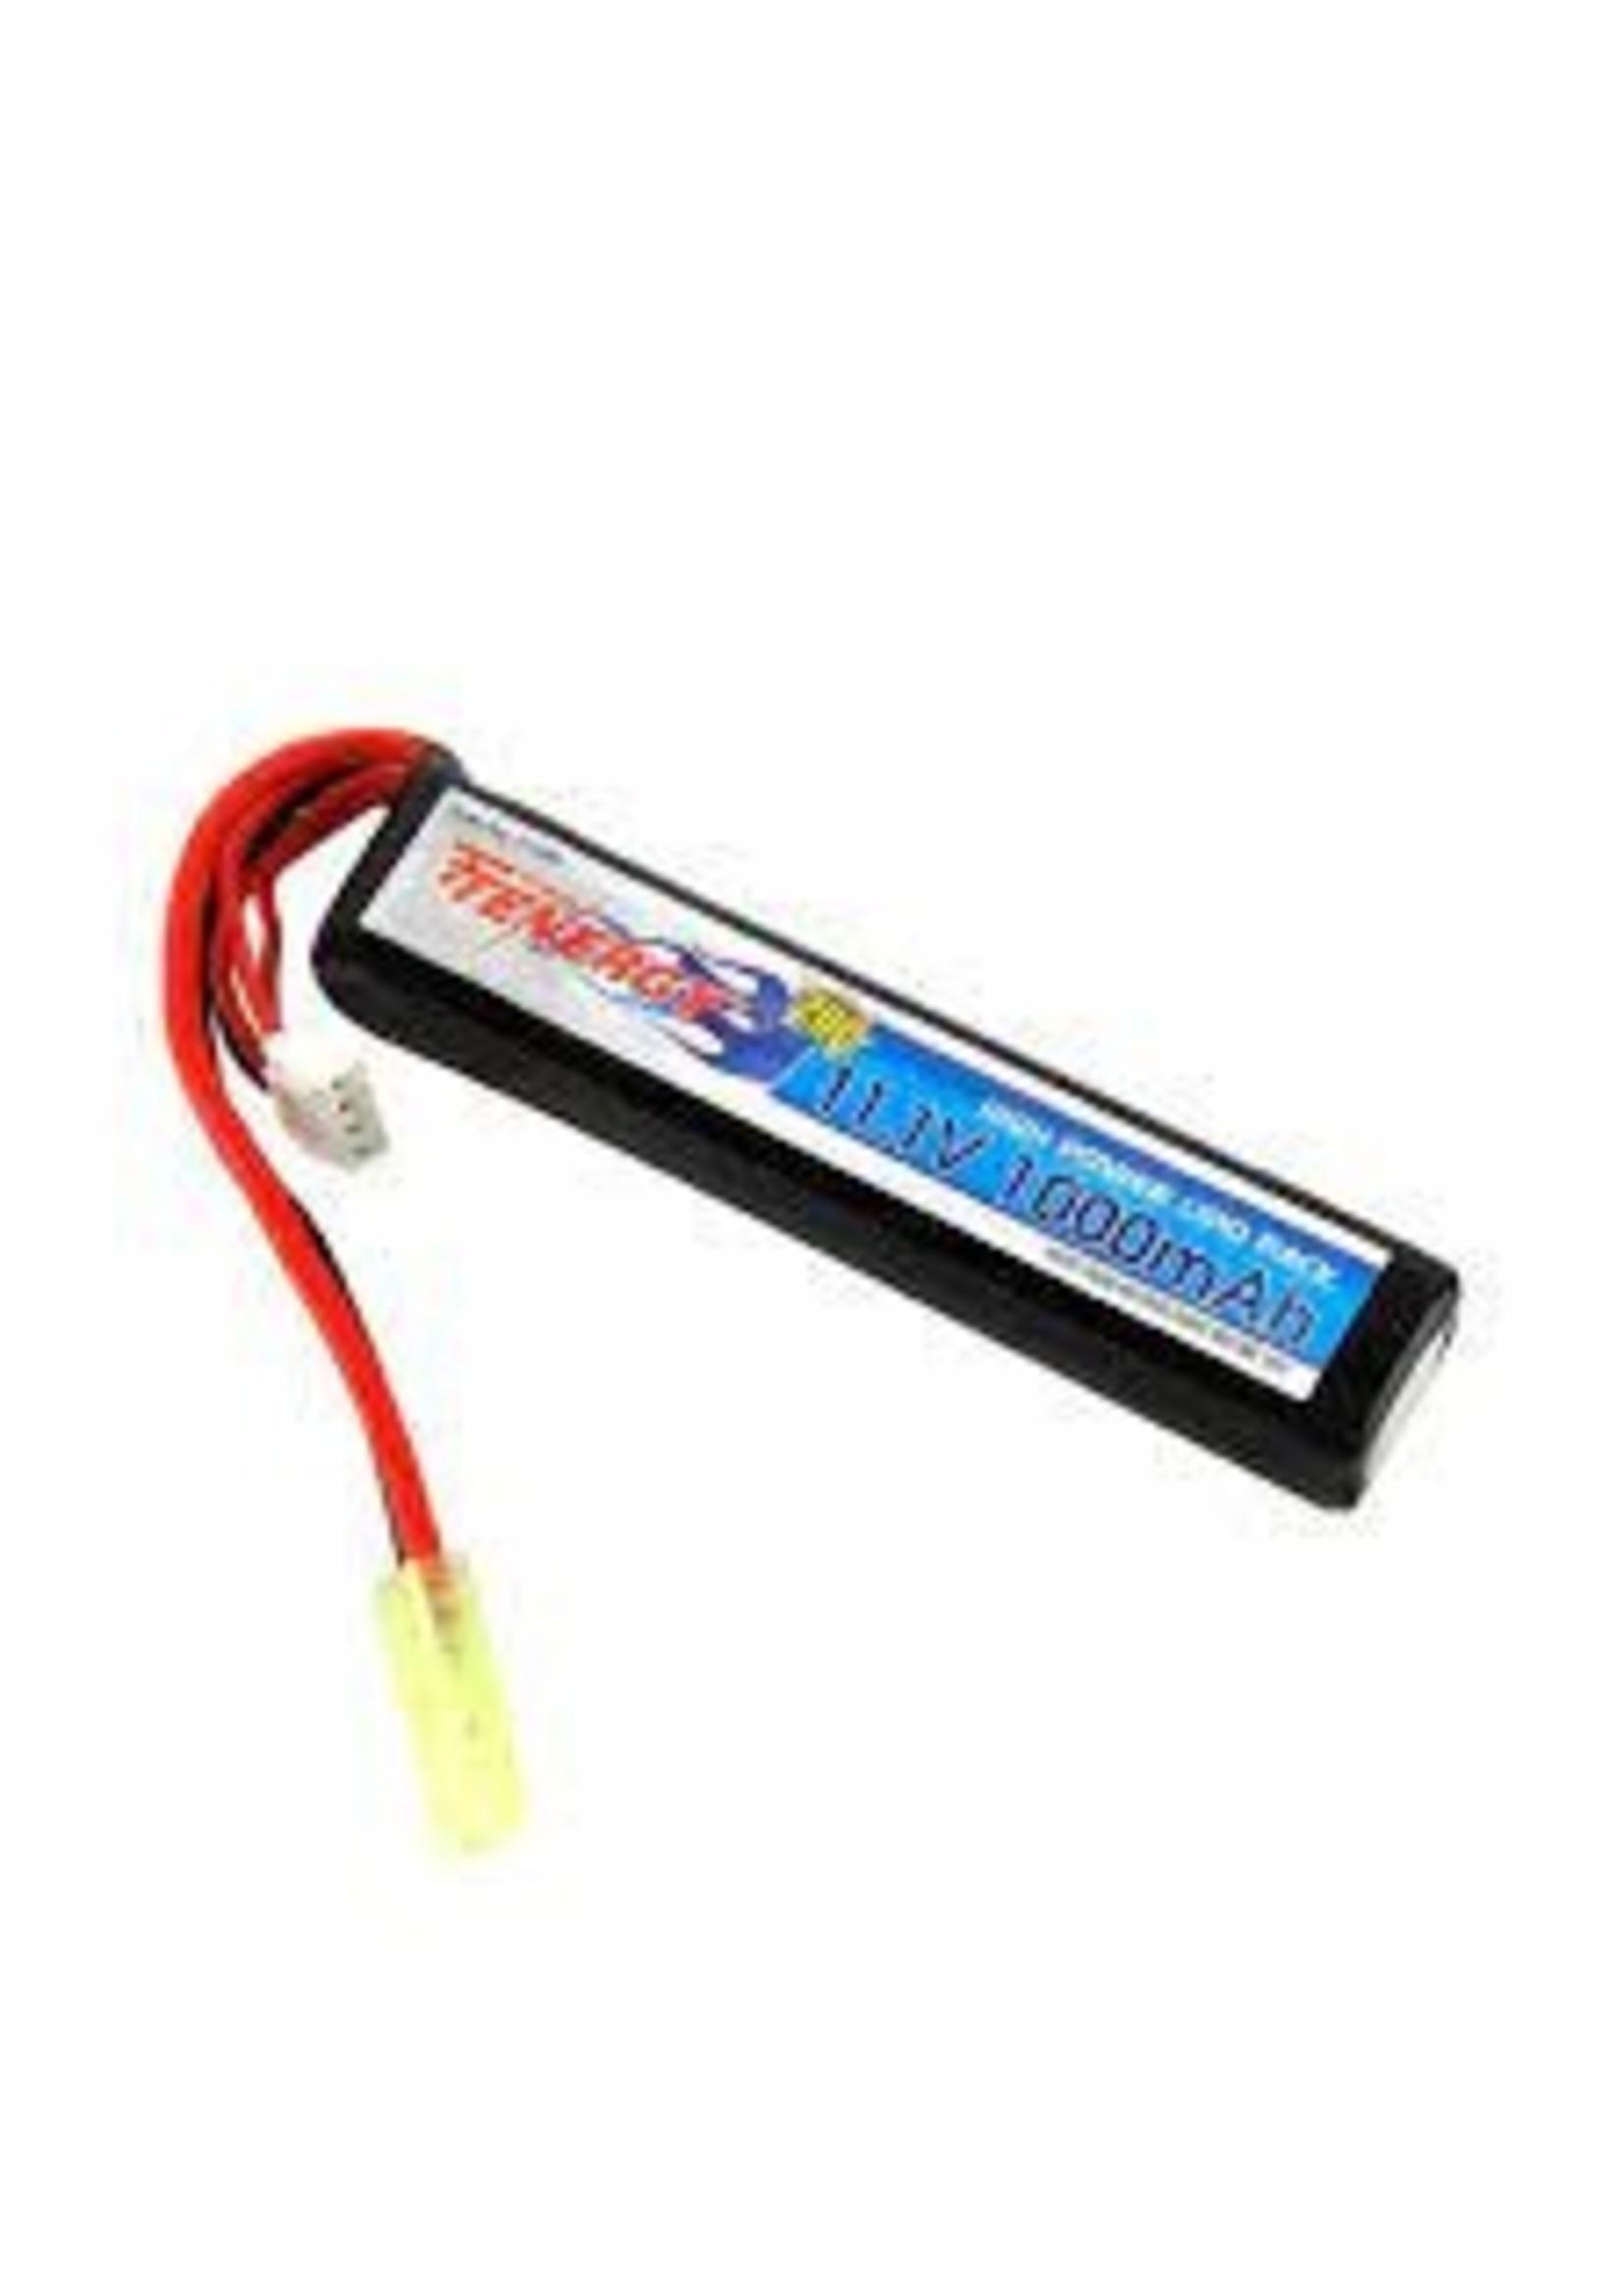 TENERGY 31598 / Tenergy 11.1V 1000mAh Battery - Li-Po Stick Pack w/ Mini Tamiya